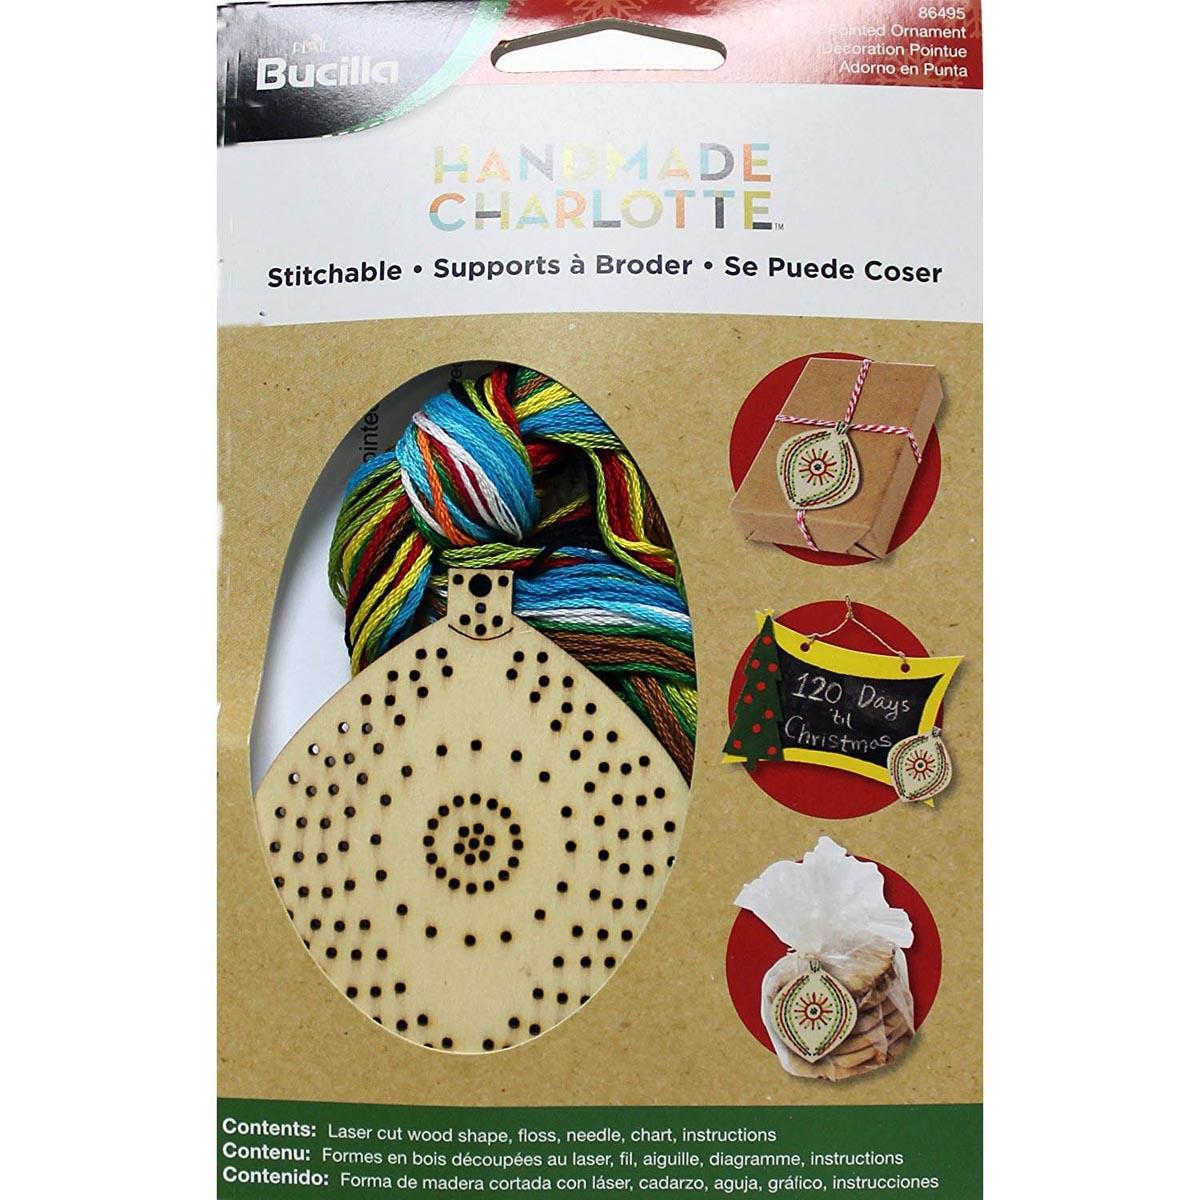 Bucilla ® Seasonal Handmade Charlotte™ Wood Stitchables - Pointed Ornament - 86495